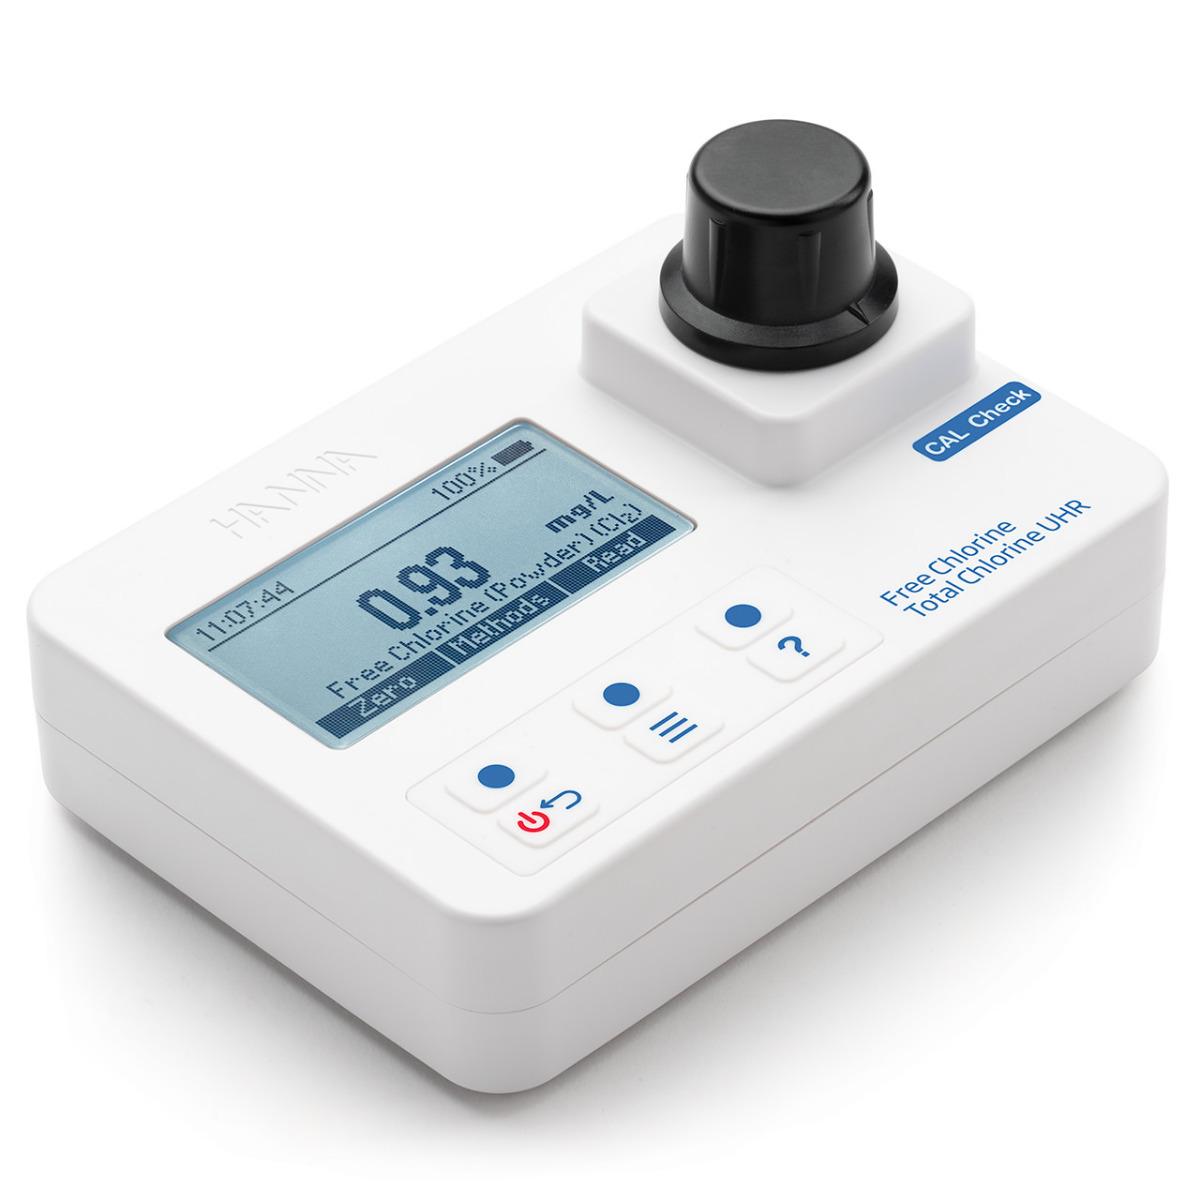 HI97771 Free Chlorine and Ultra High Range Total Chlorine Portable Photometer